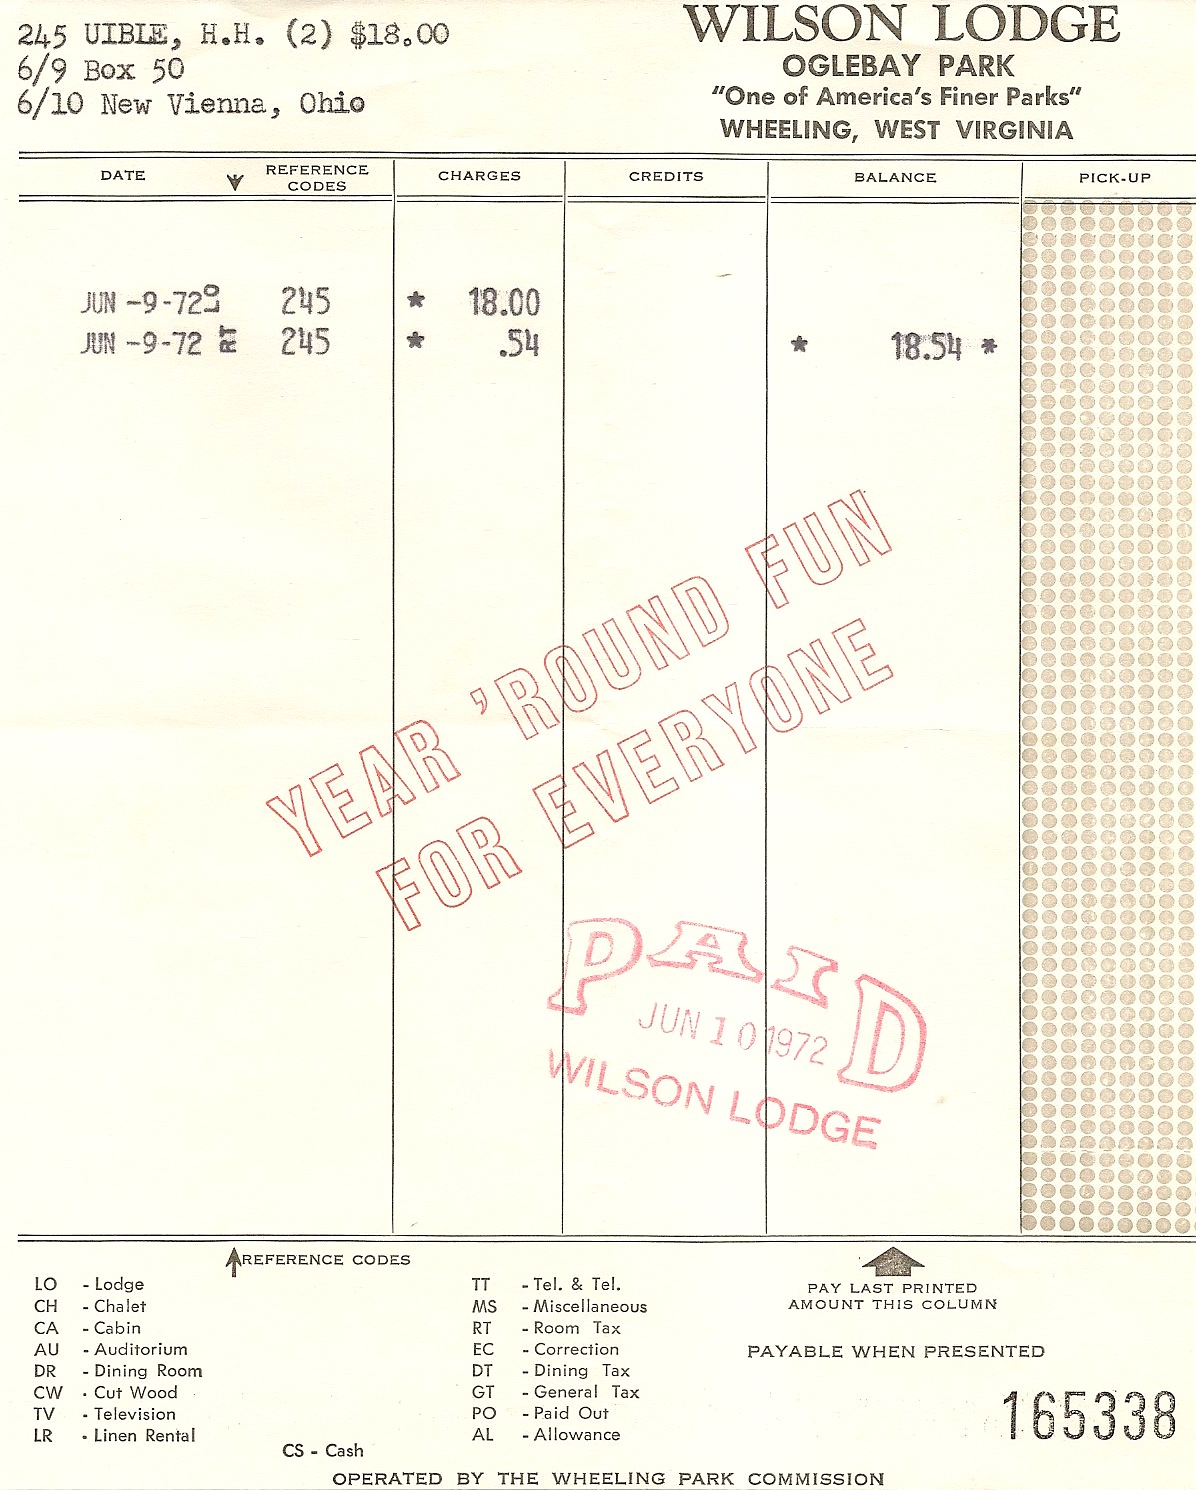 uibles a family blog 1972 oglebay park wilson lodge hotel bill june 9